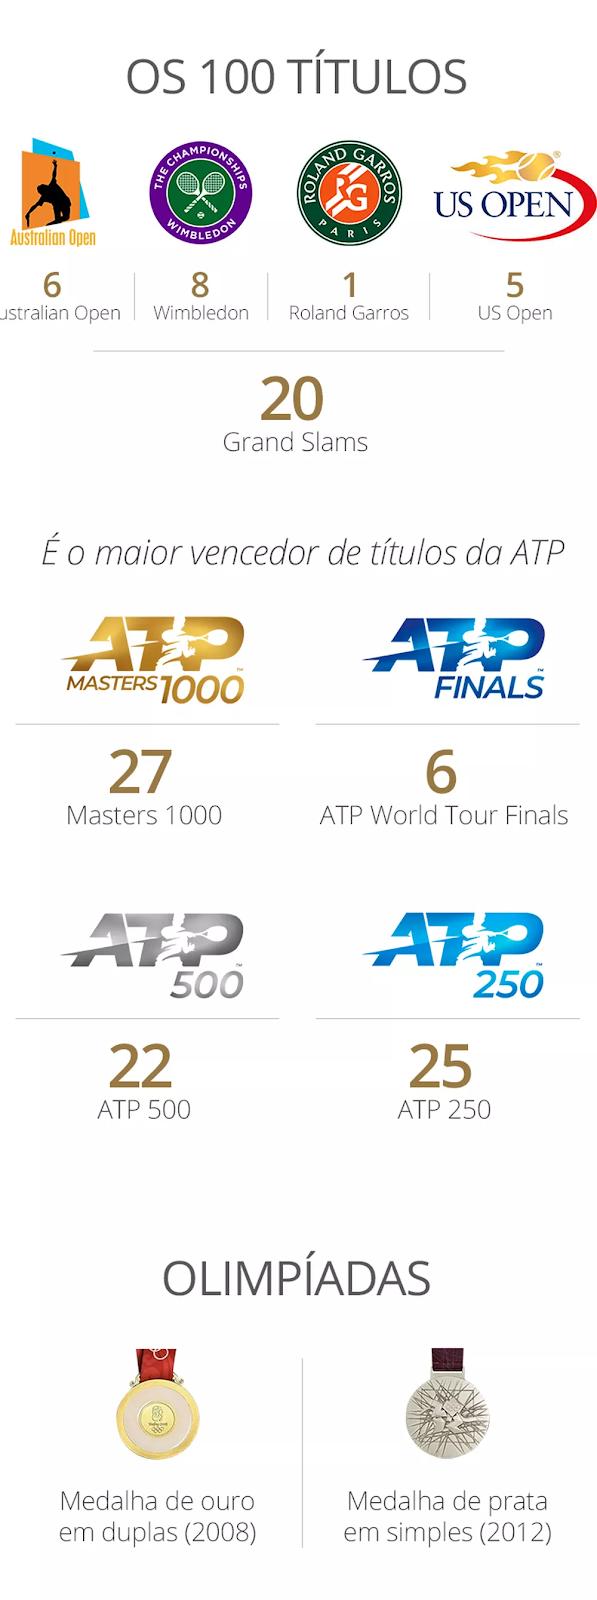 Os 100 títulos de Federer